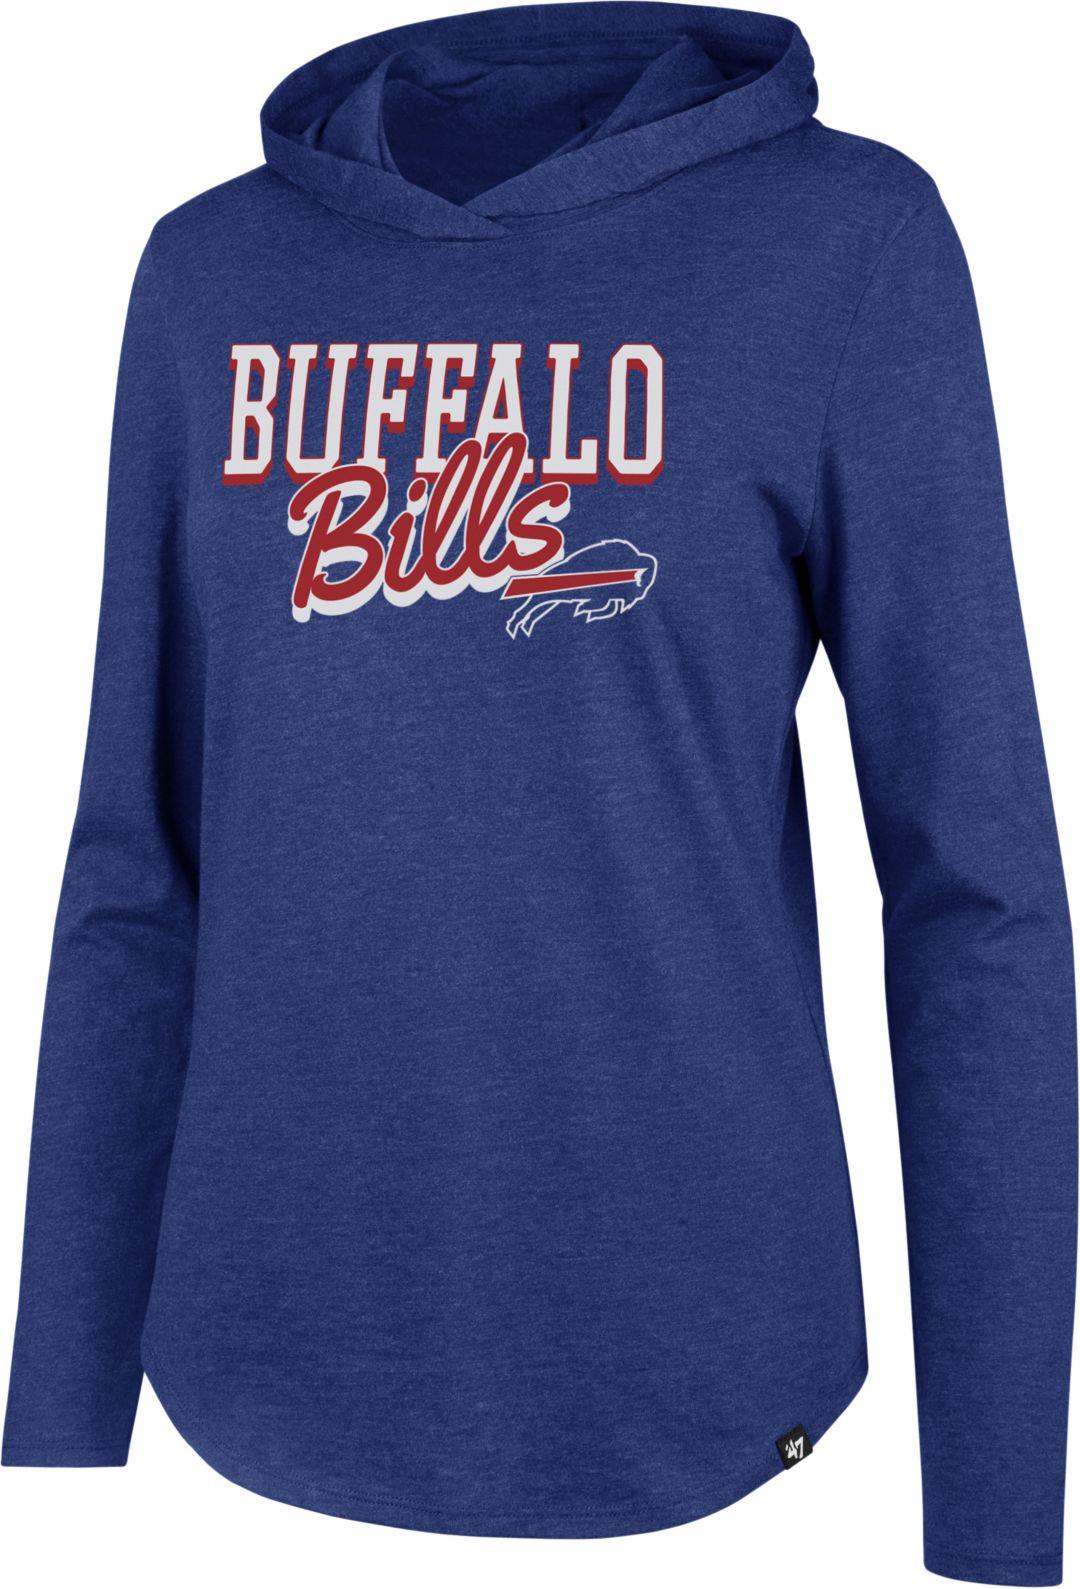 4ec9cdb0 '47 Women's Buffalo Bills Club Royal Hooded Long Sleeve Shirt